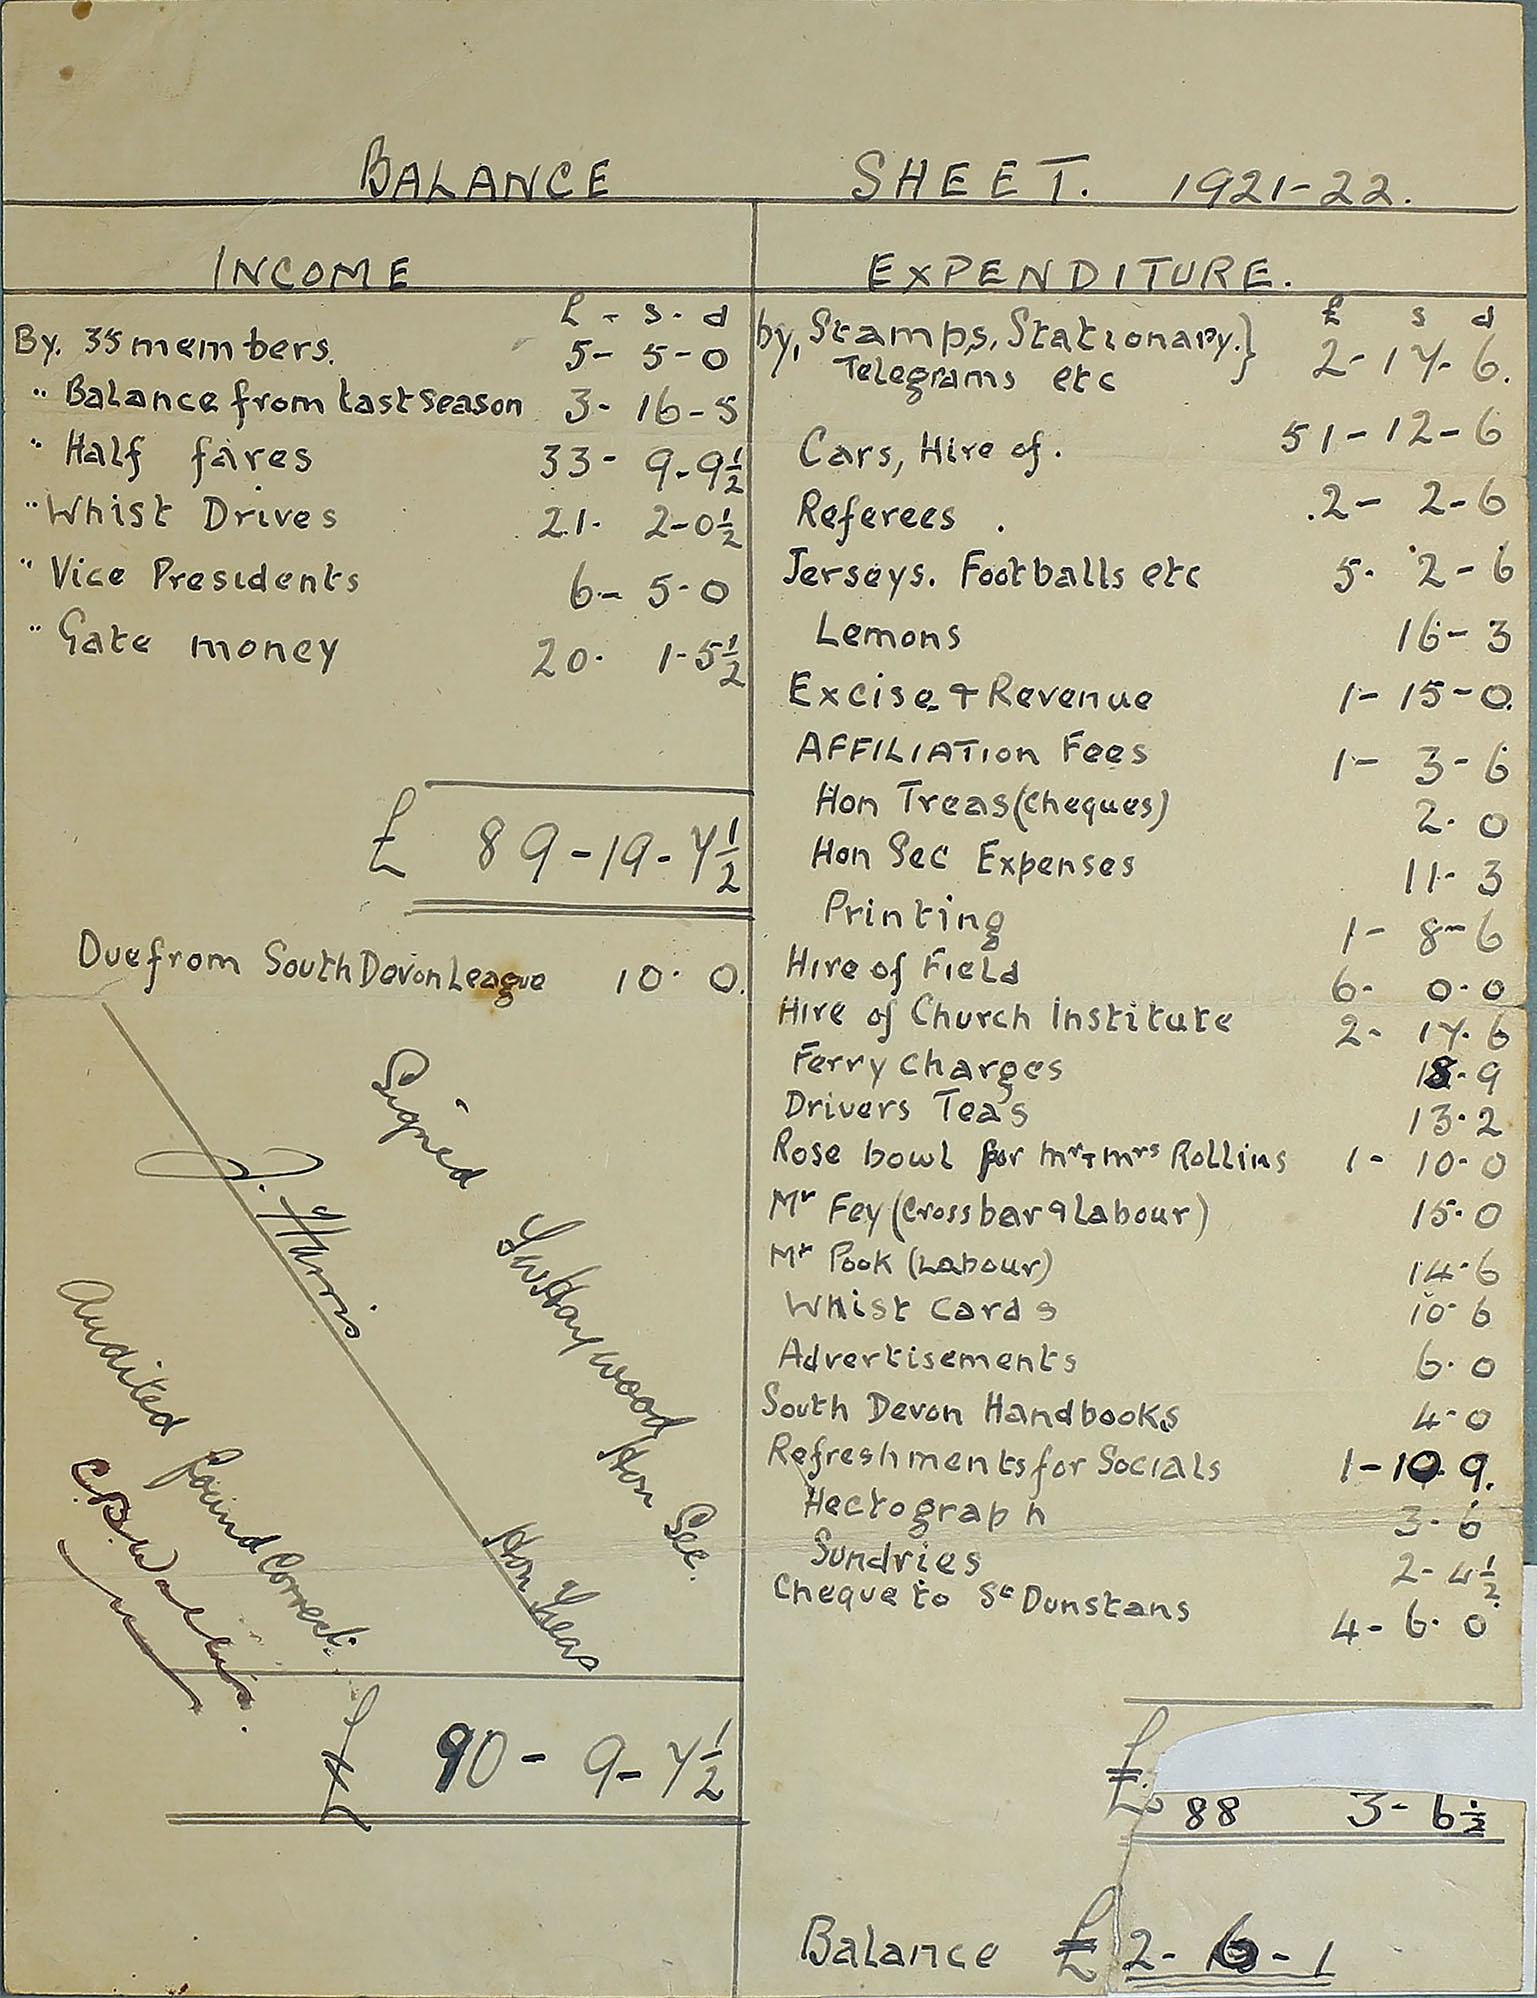 Bishopsteignton Association Football Club Balance Sheet 1921-22